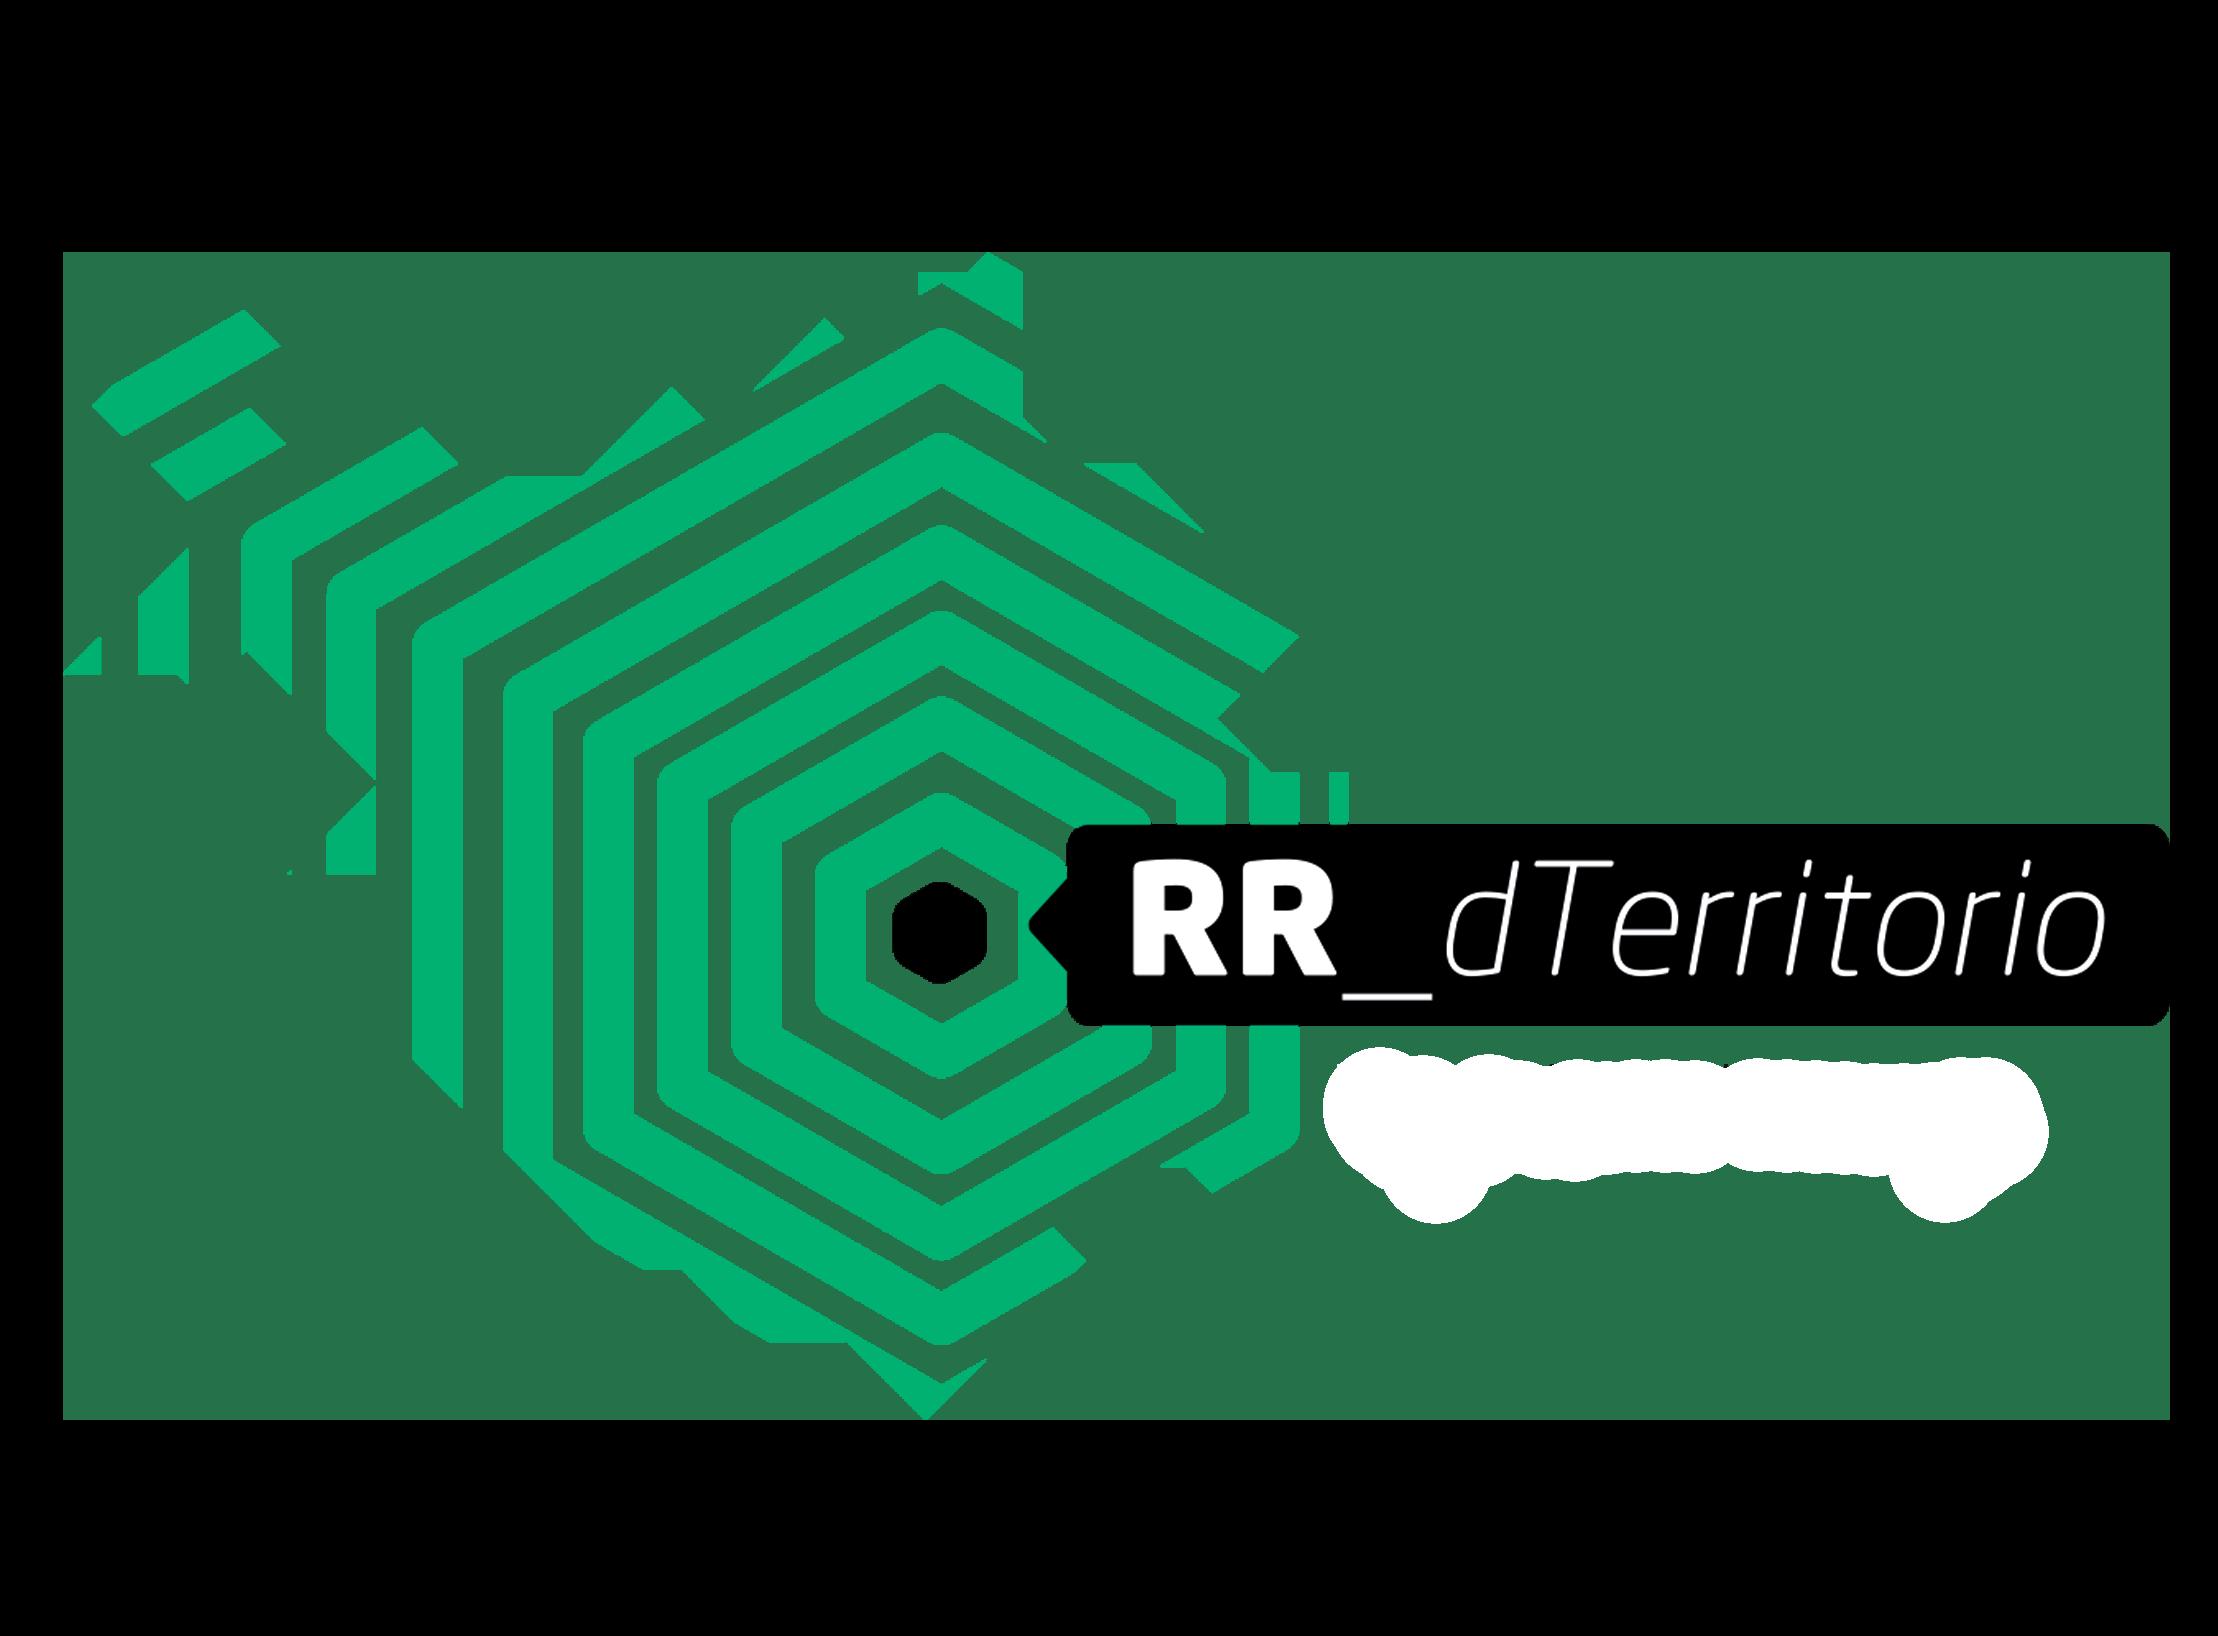 Logo RR_dTerritorio